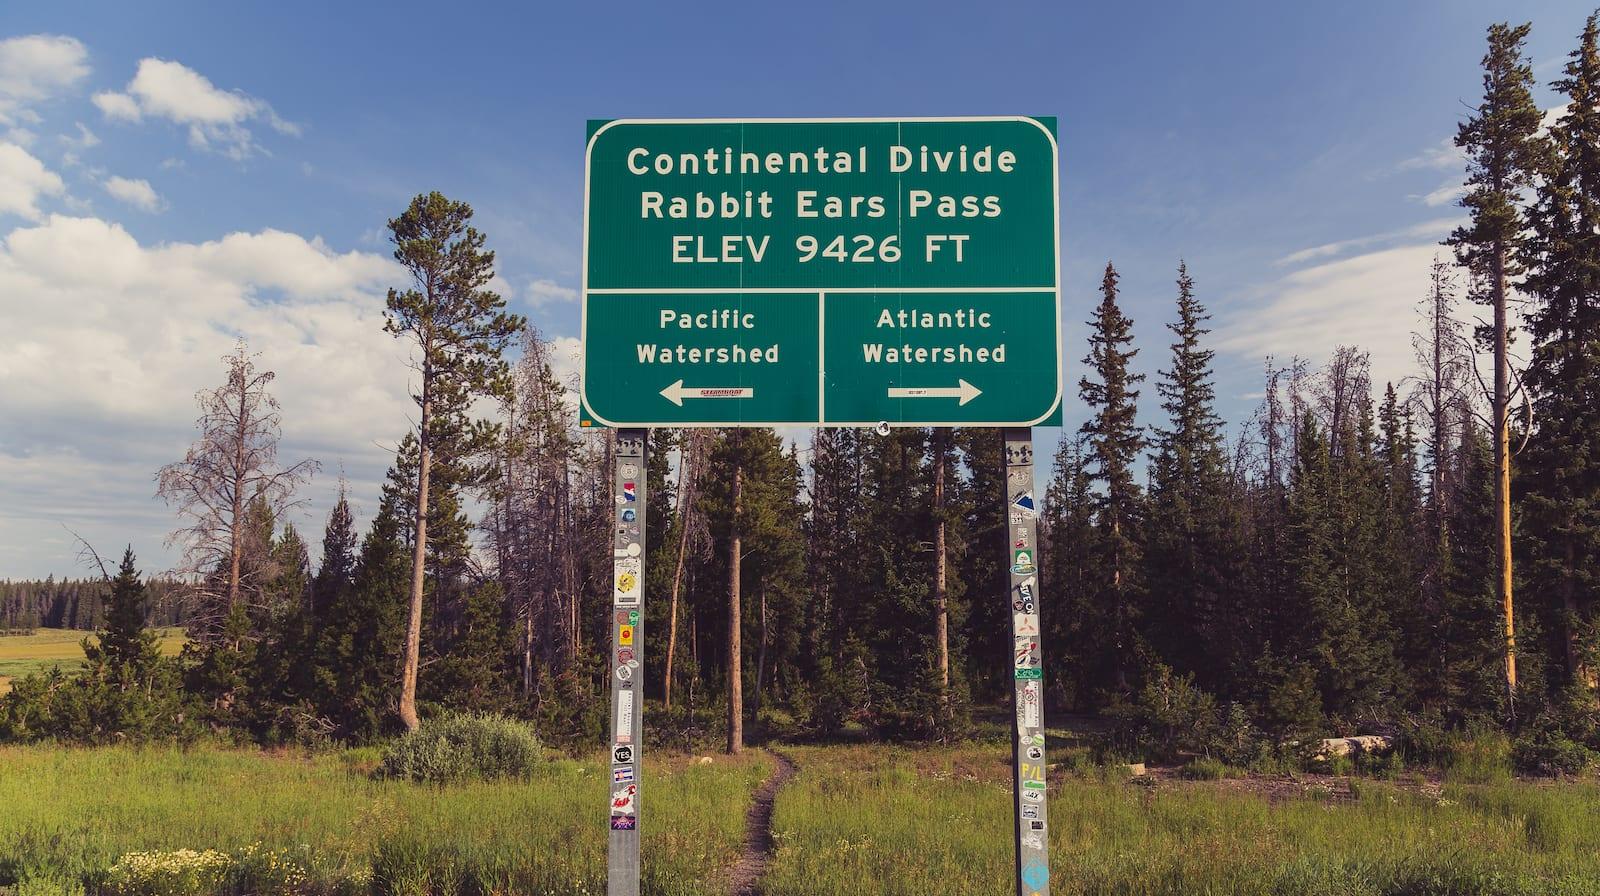 Rabbit Ears Pass Continental Divide Sign